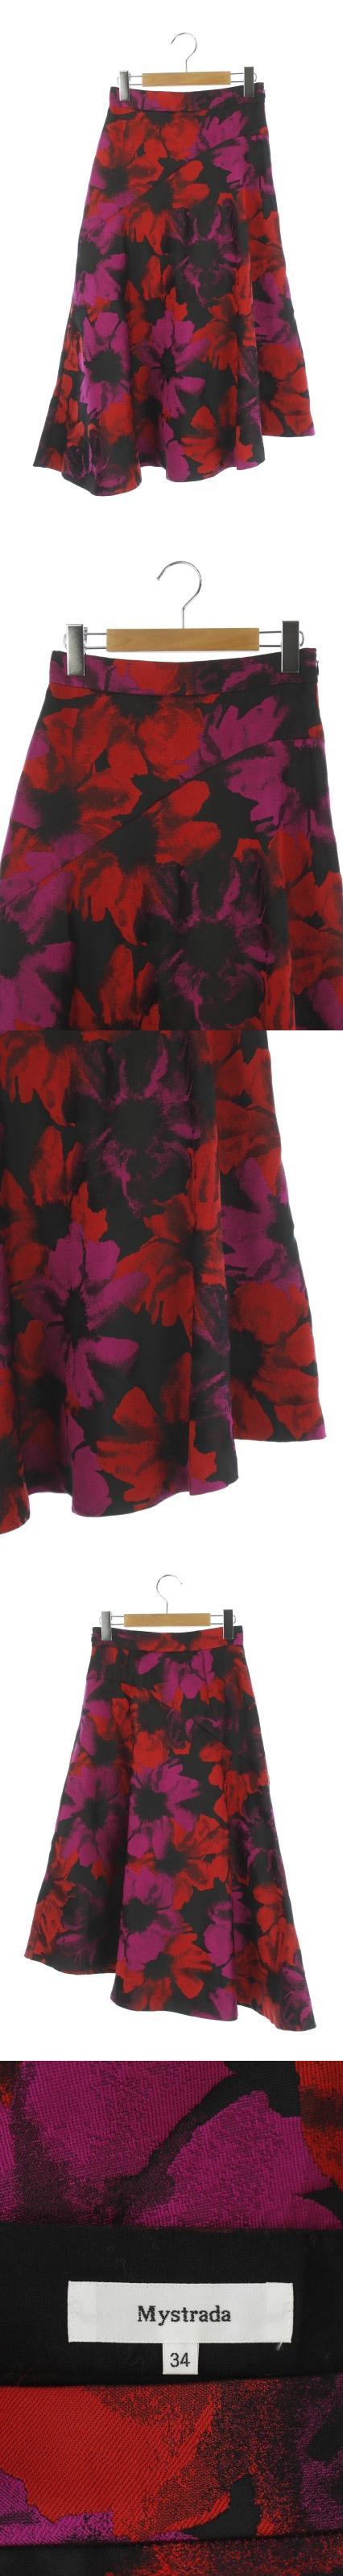 18AW スカート ロング フレア ジャガード 総柄 34 黒 ピンク /AO ■OS